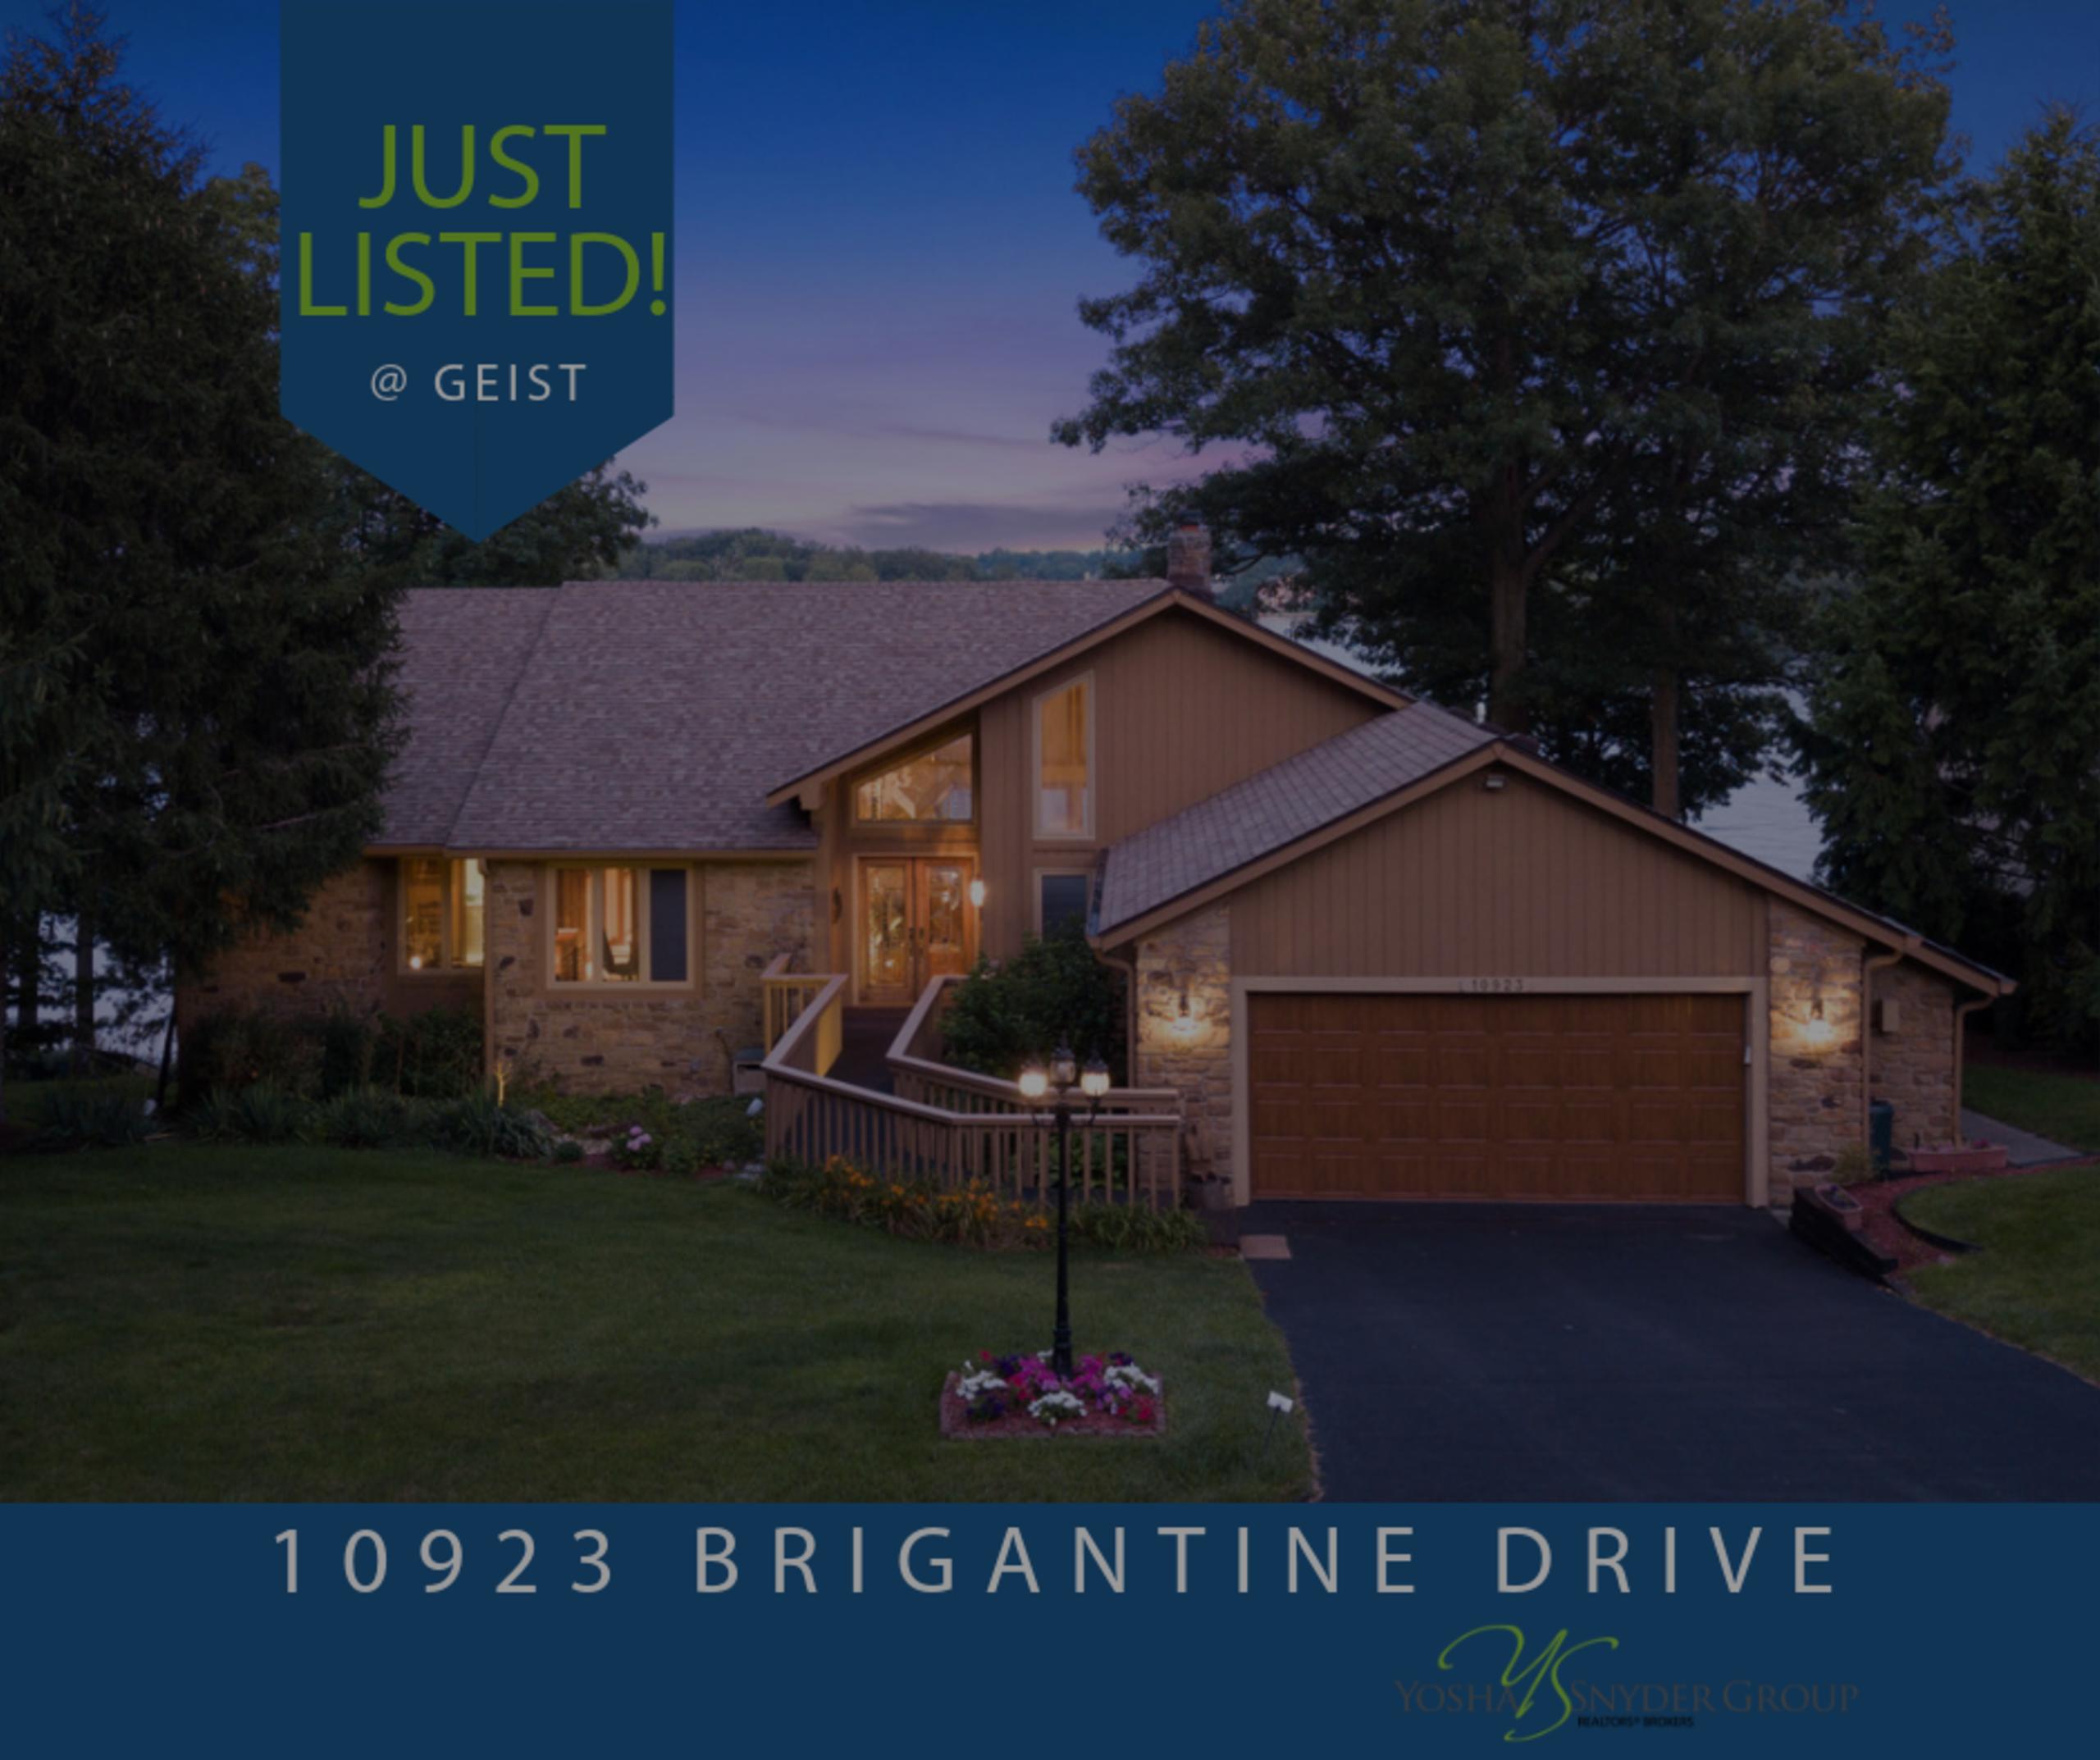 10923 Brigantine Drive